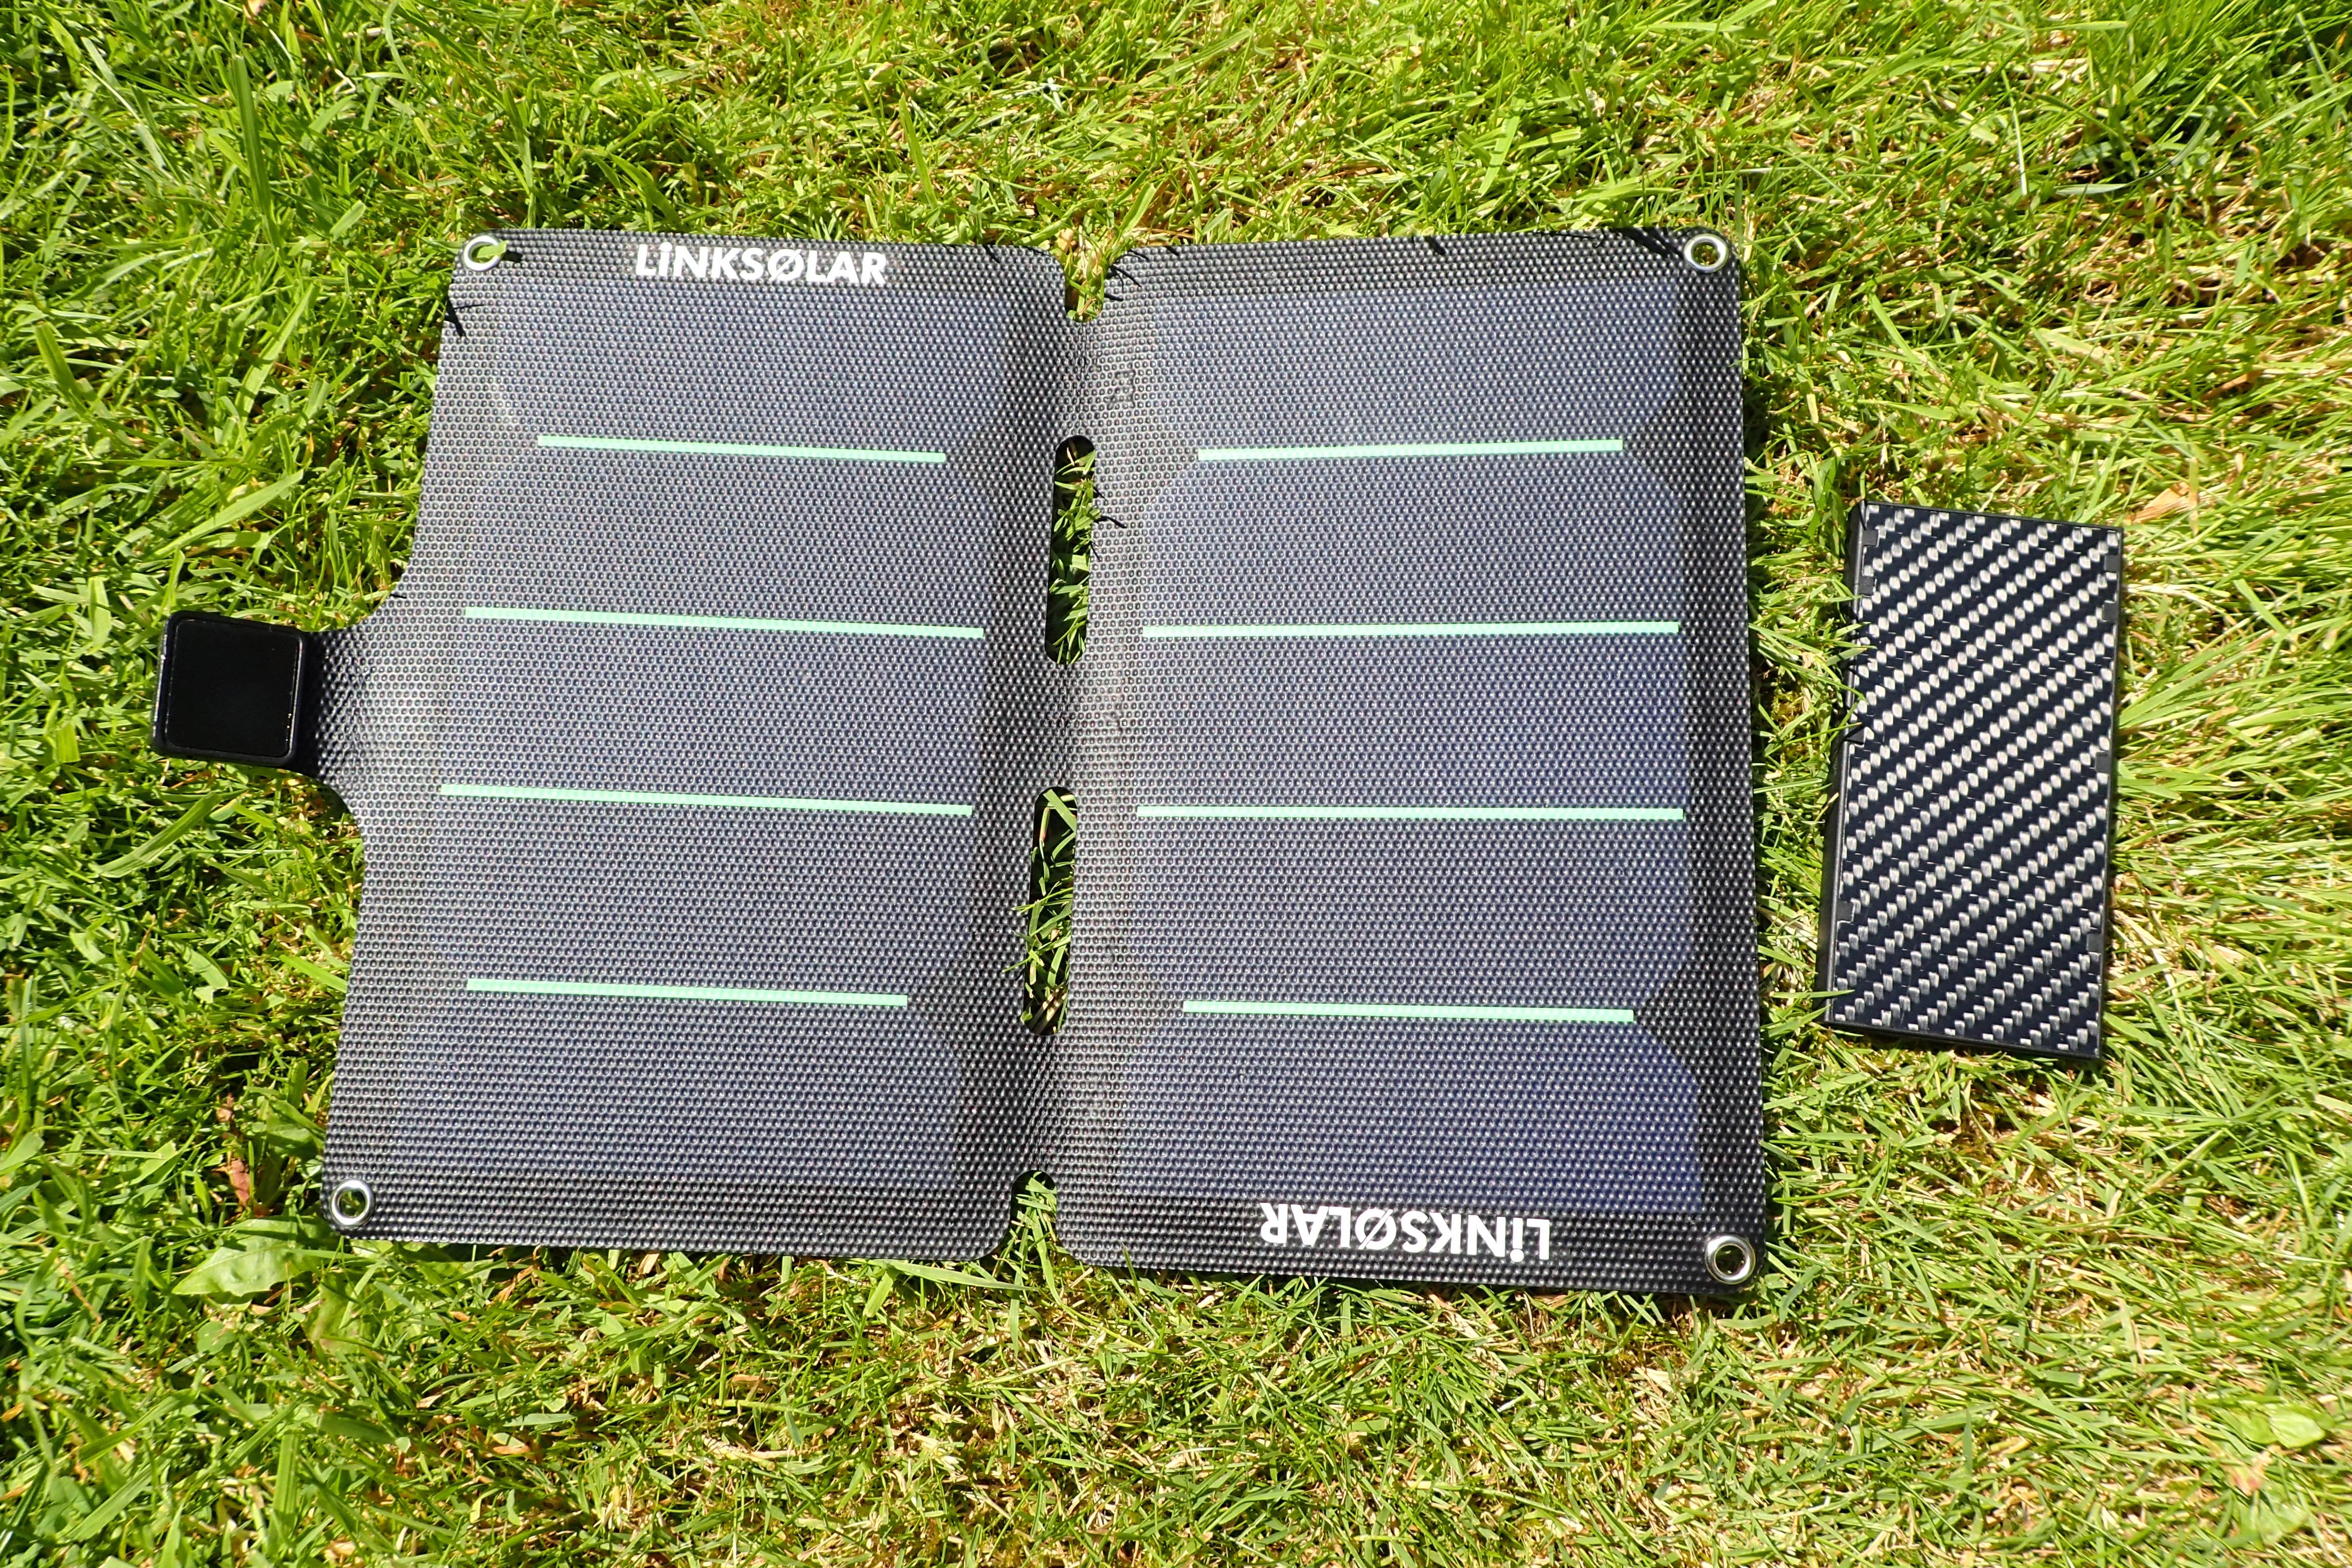 Link Solar 11w panel with Nitecore NB100000 Powerbank